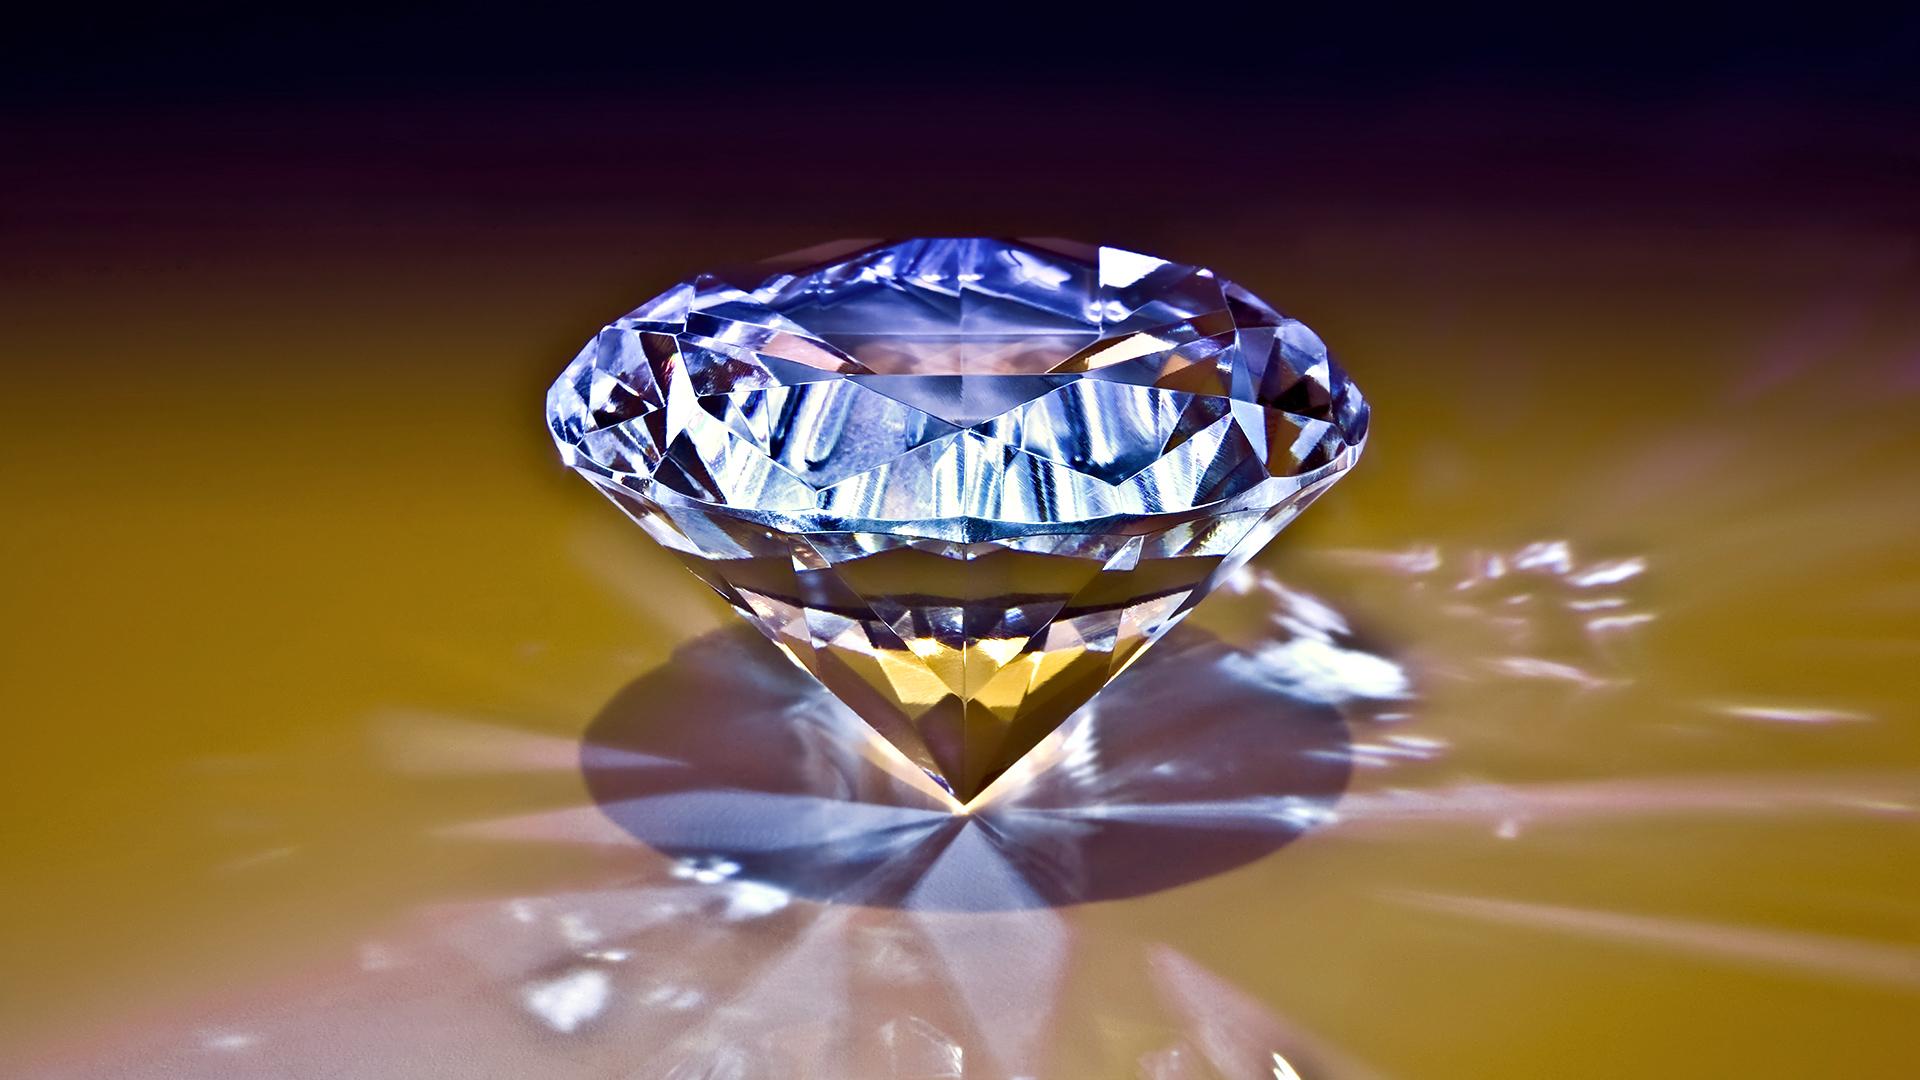 Обои бриллиант, блеск, luxury для рабочего стола – картинка #17686 ...